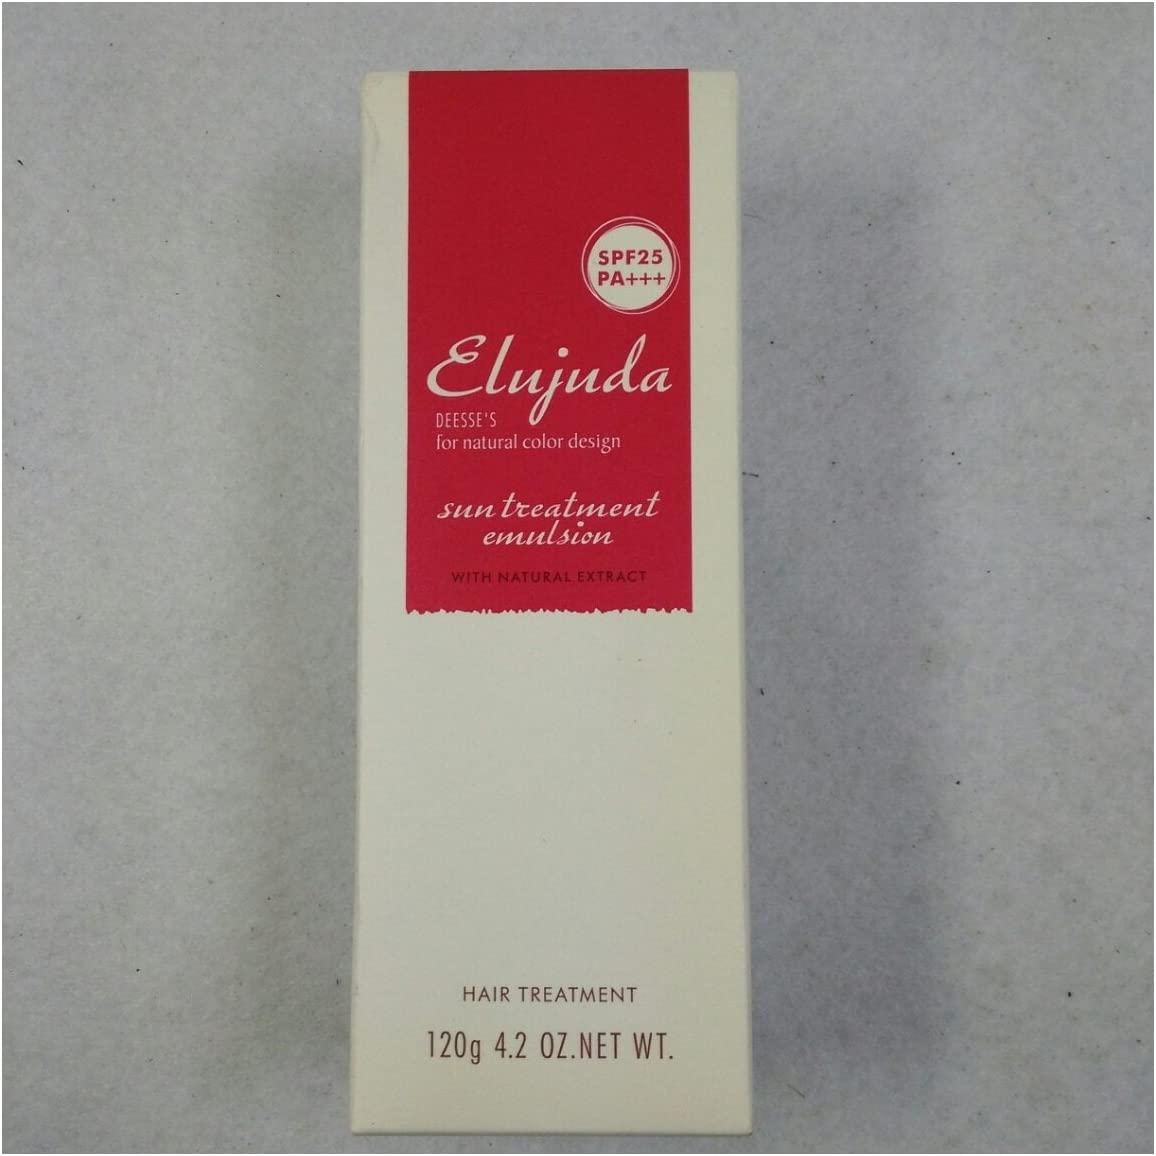 Elujuda(エルジューダ) サントリートメントエマルジョンの商品画像2